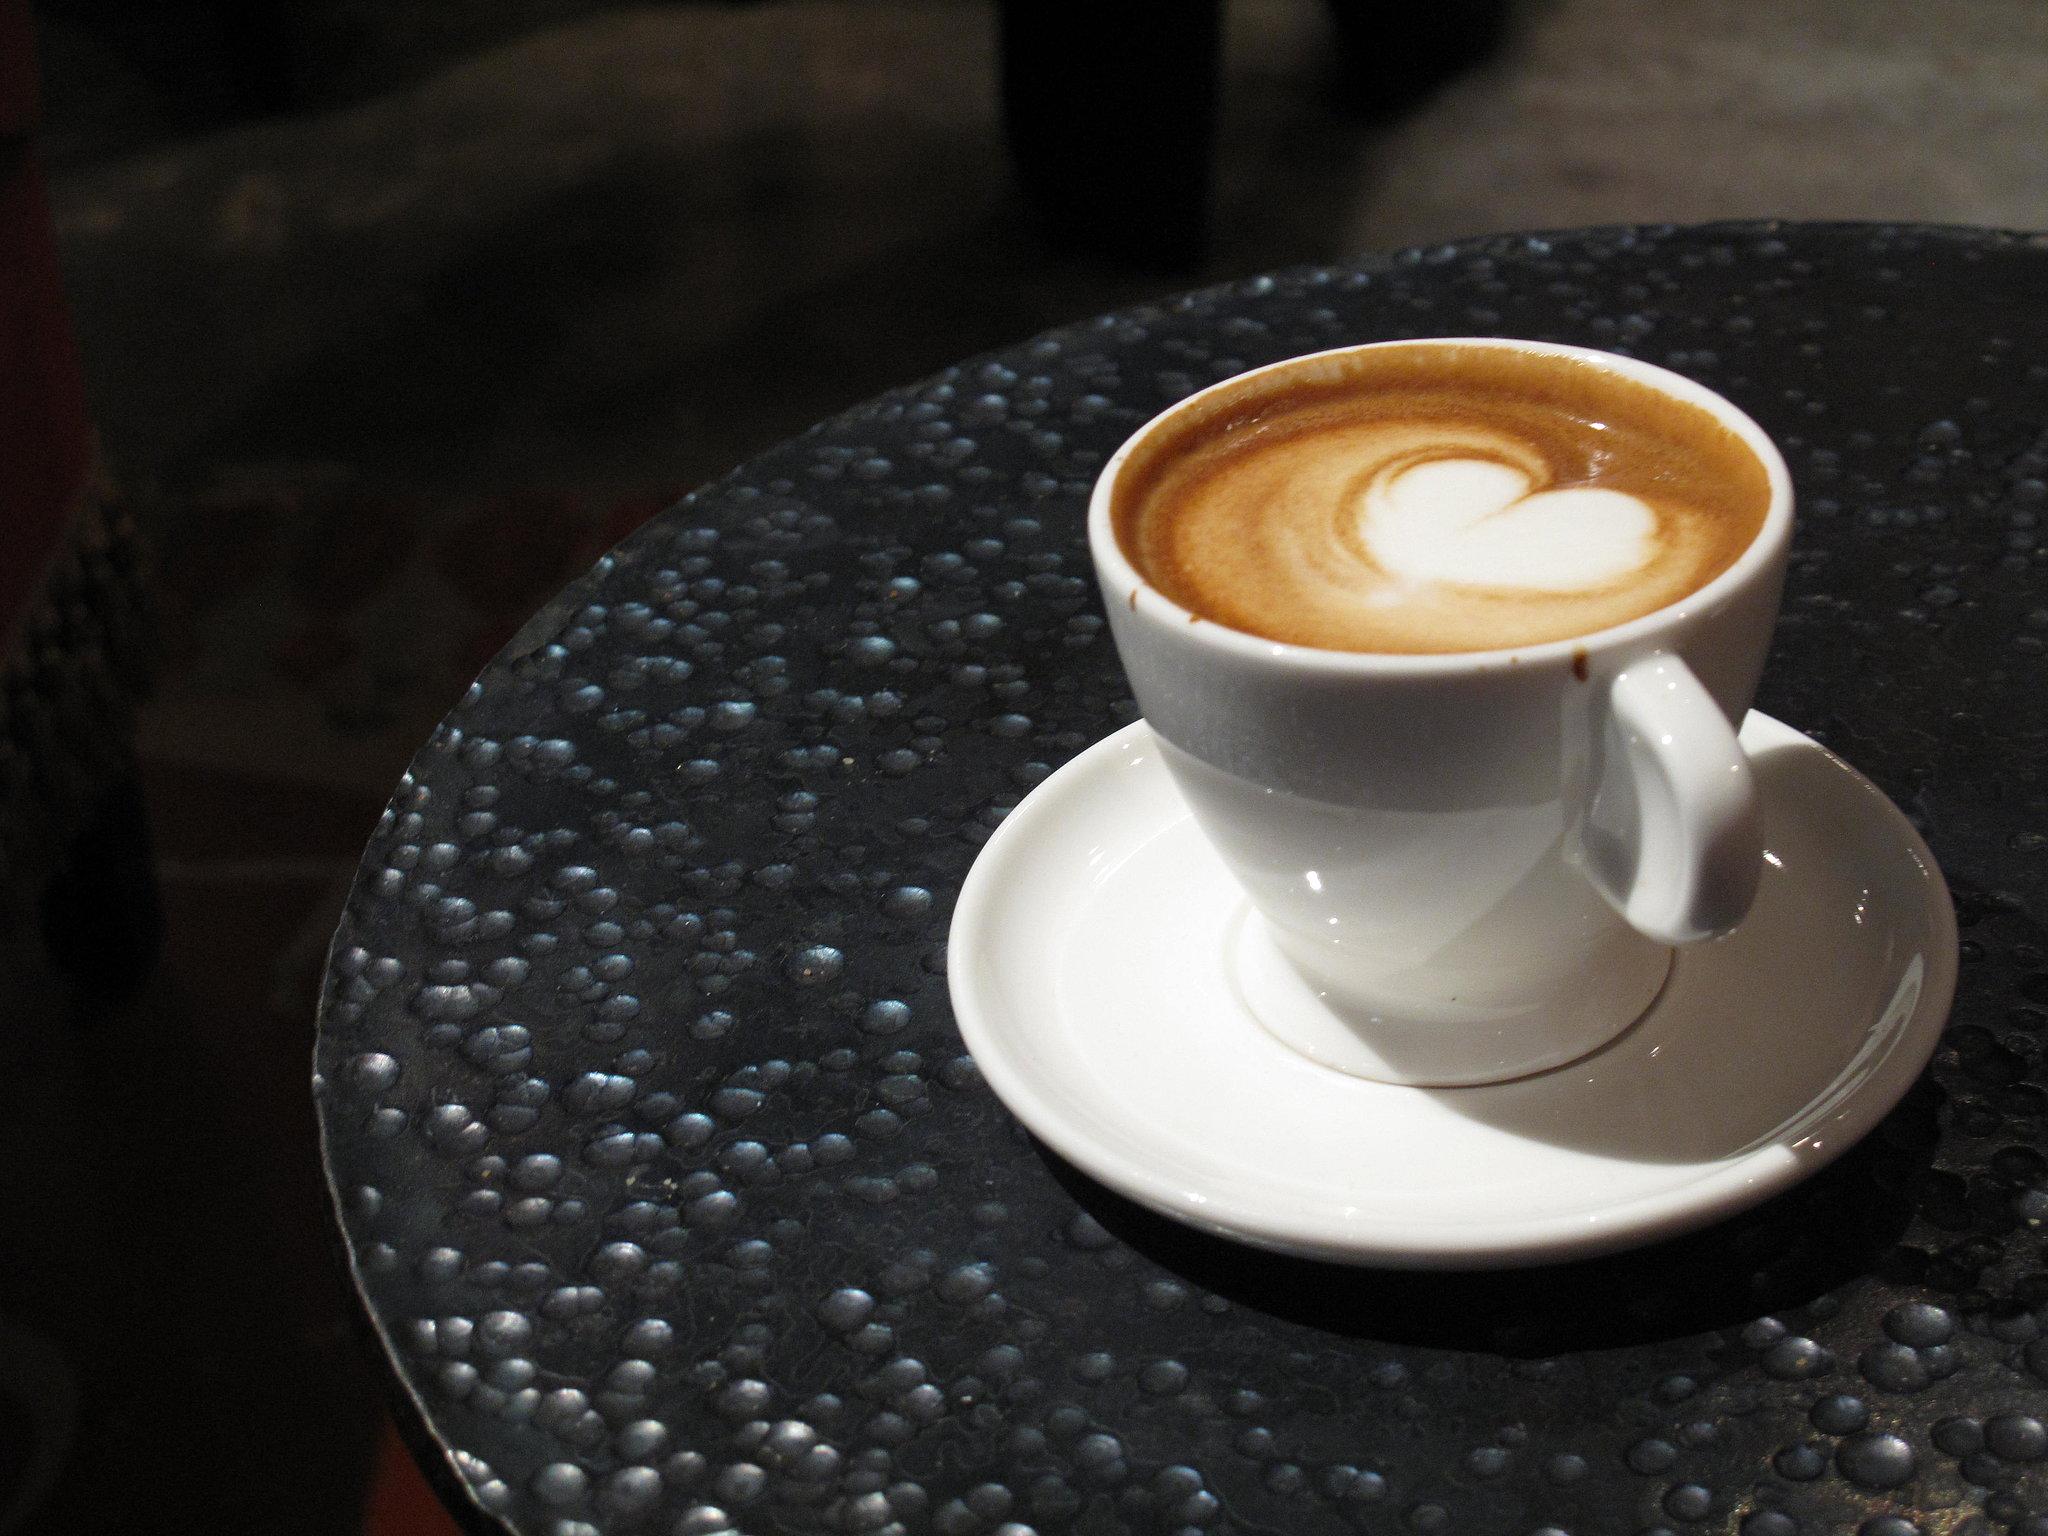 Italy: Coffee